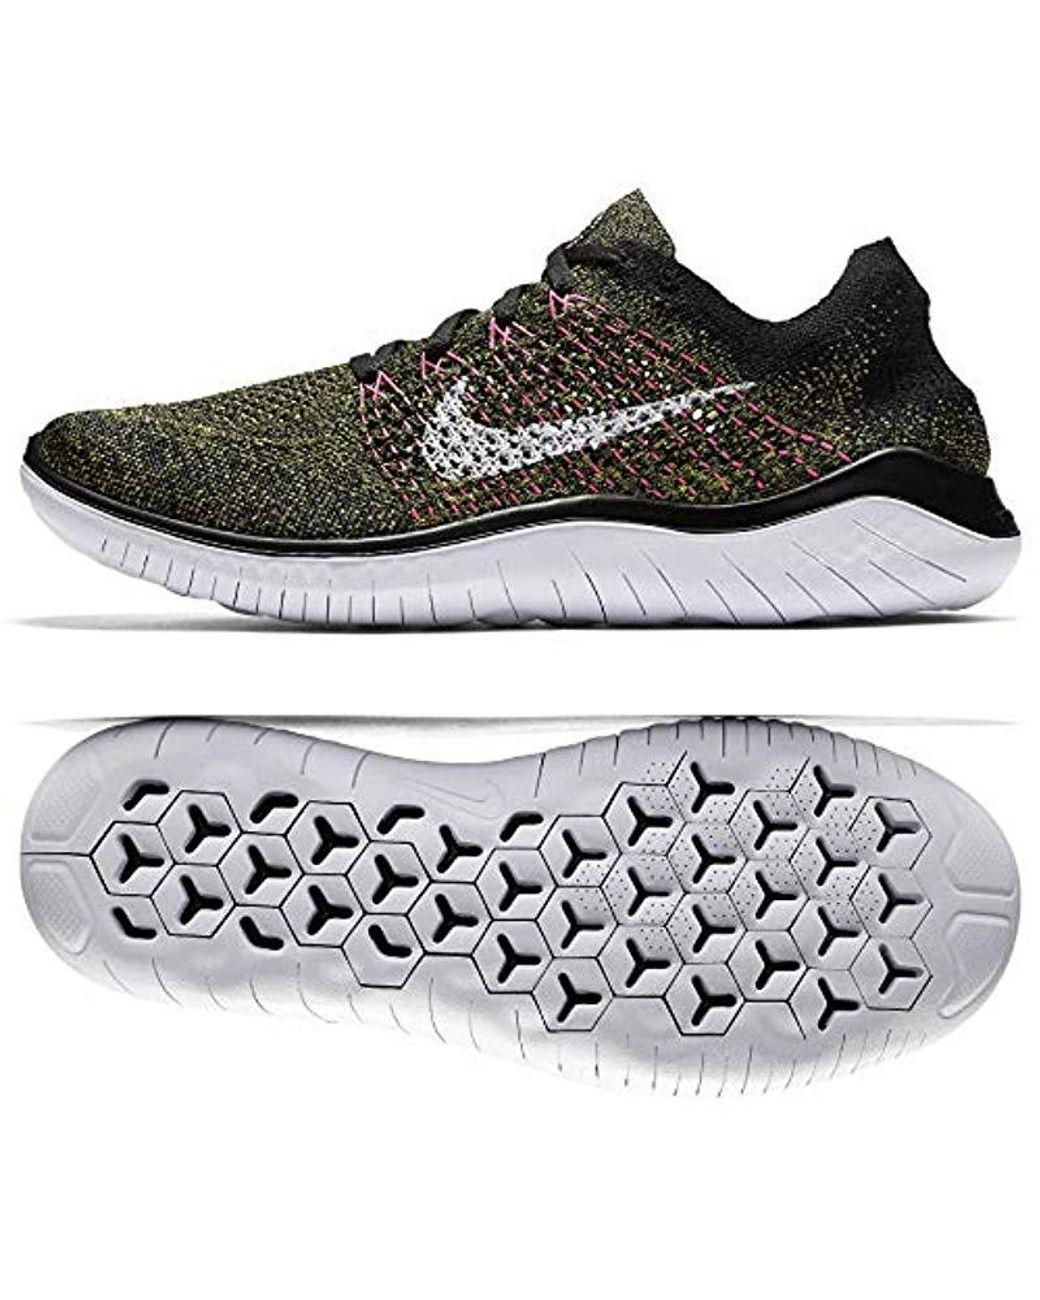 Nike Herren Laufschuh Free Run Flyknit 2018, Scarpe Running